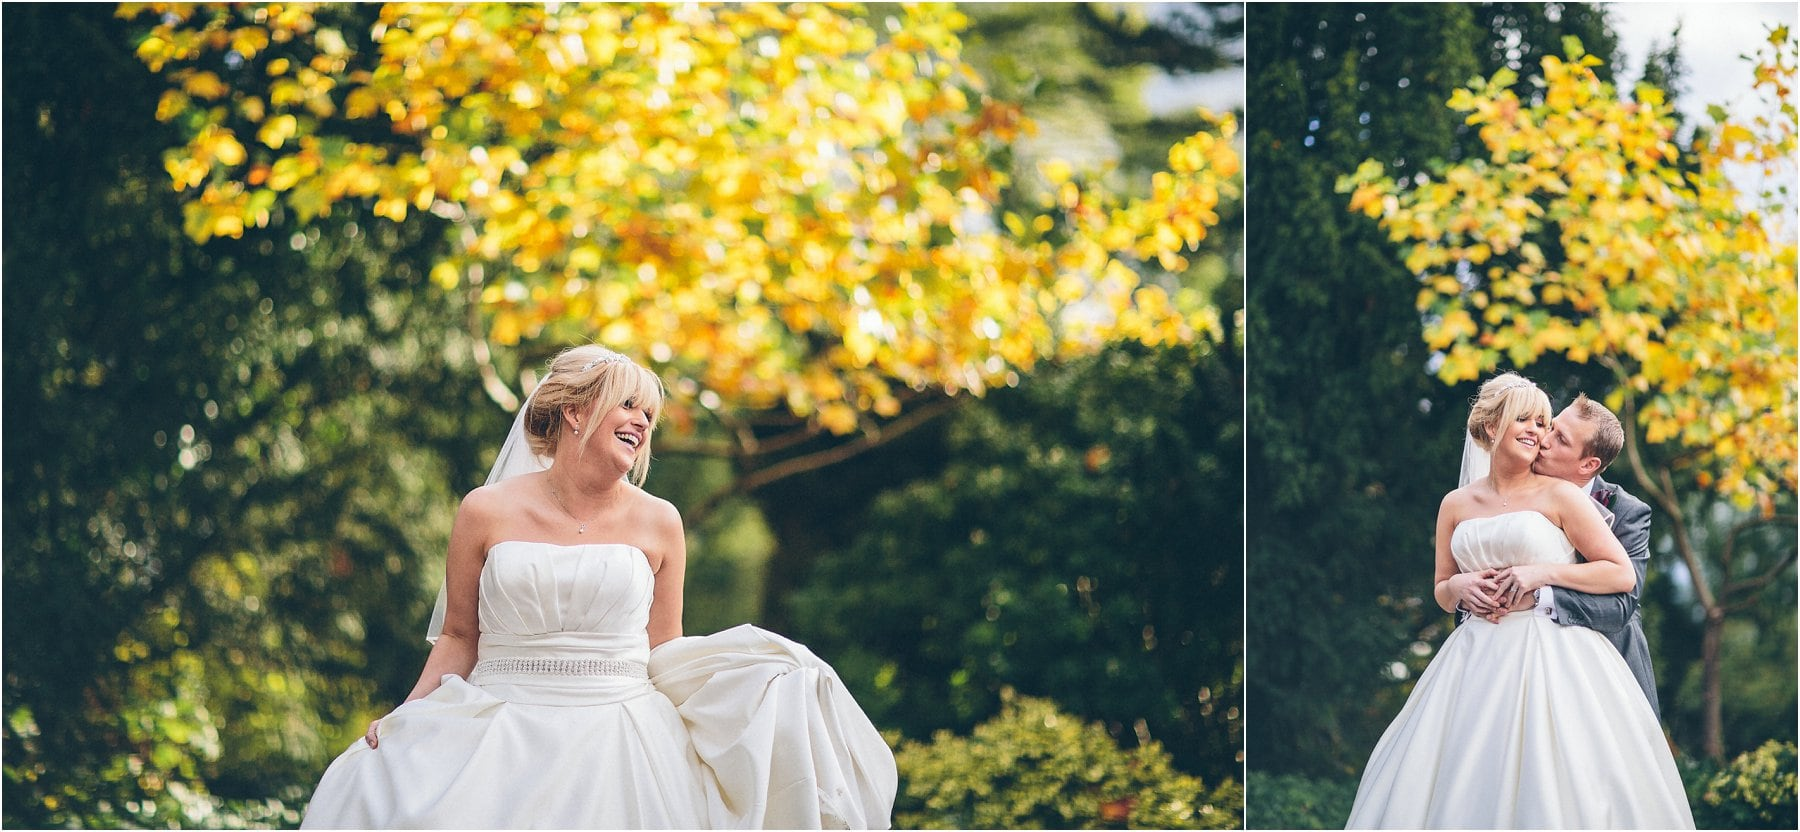 Crabwall_Manor_Wedding_Photography_0068